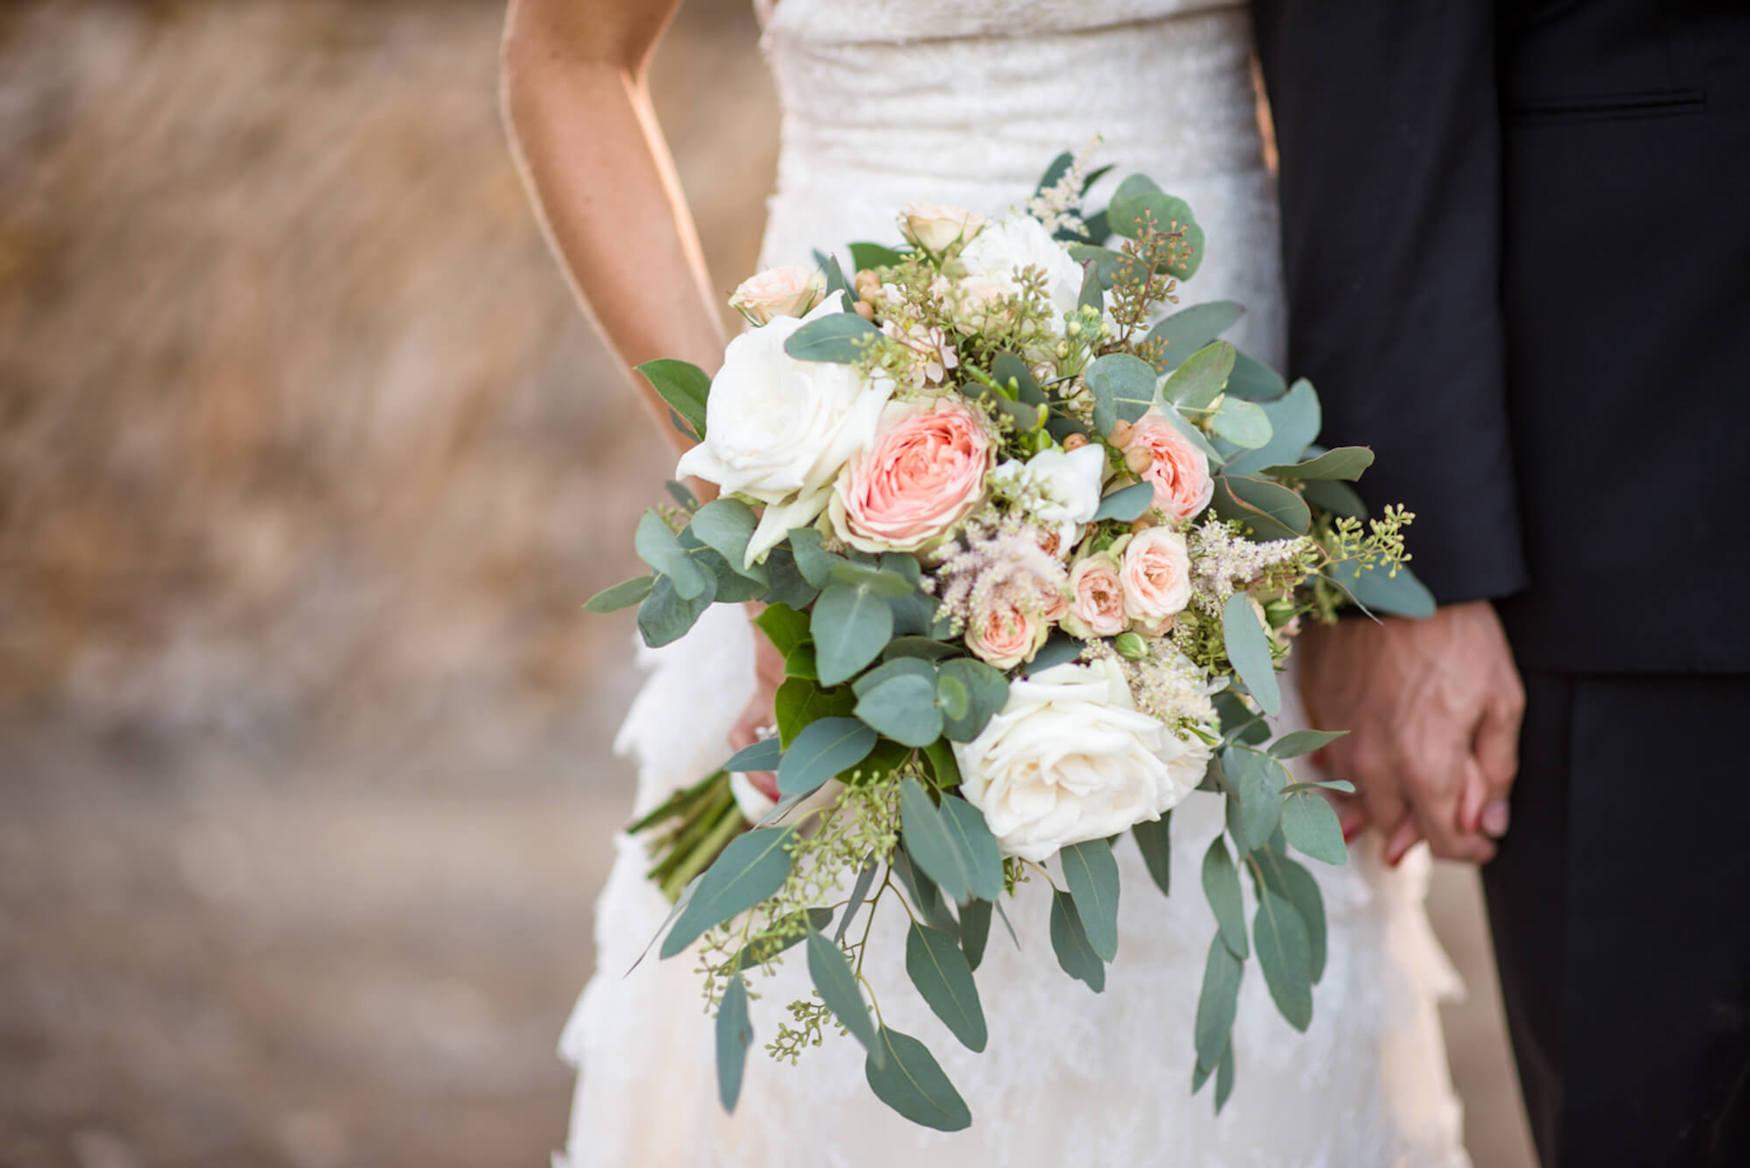 wedding flowers bouquet pink roses eucaliptus